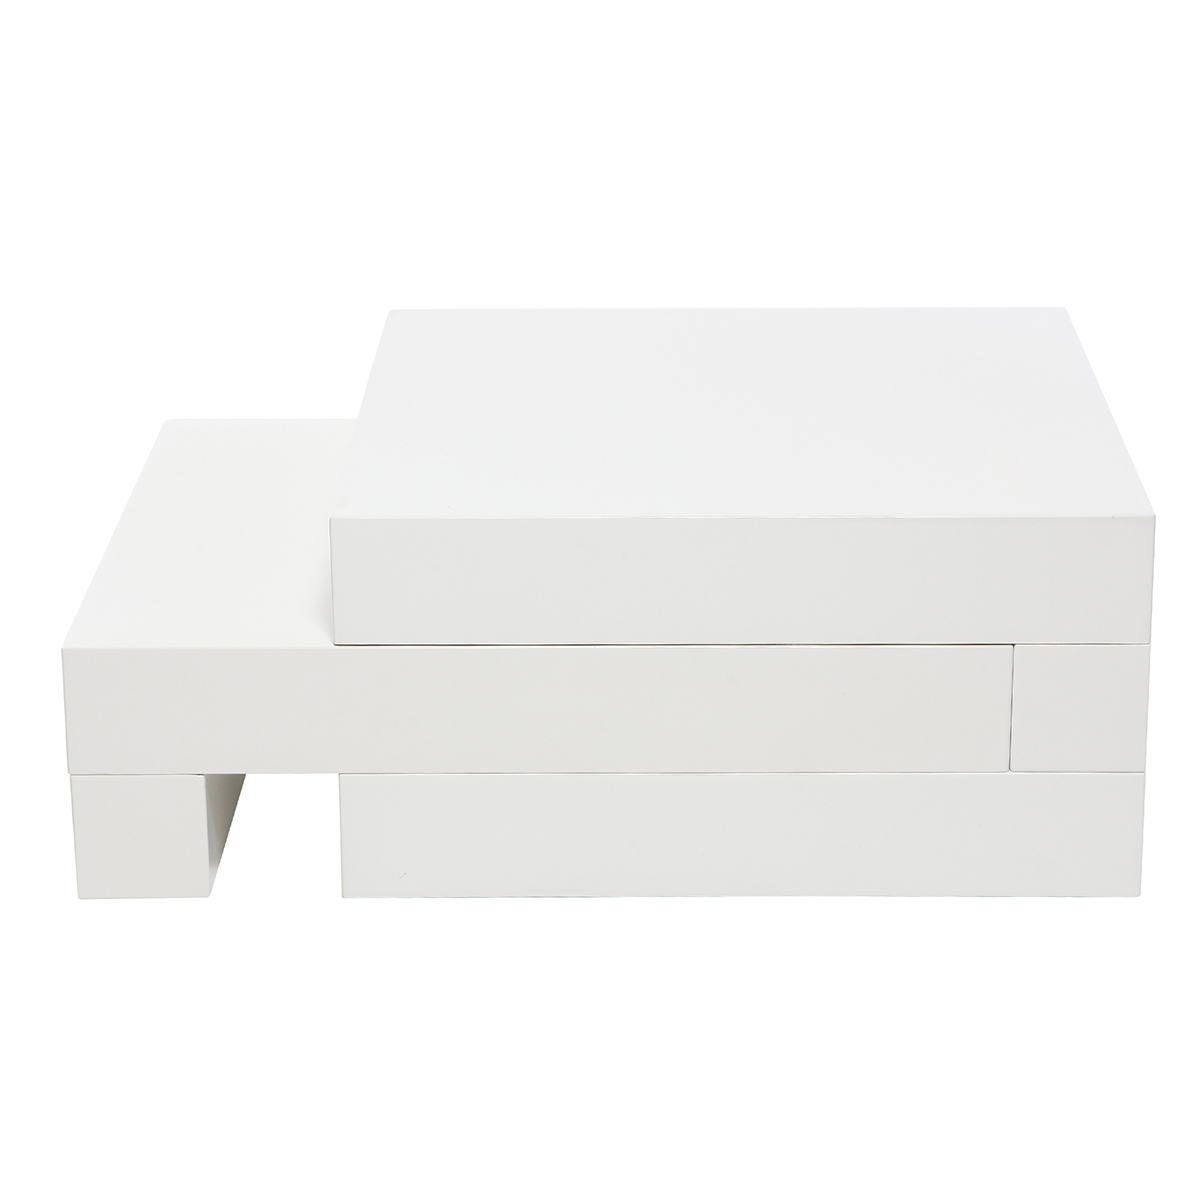 4f141a41026f26 Table basse design blanc brillant